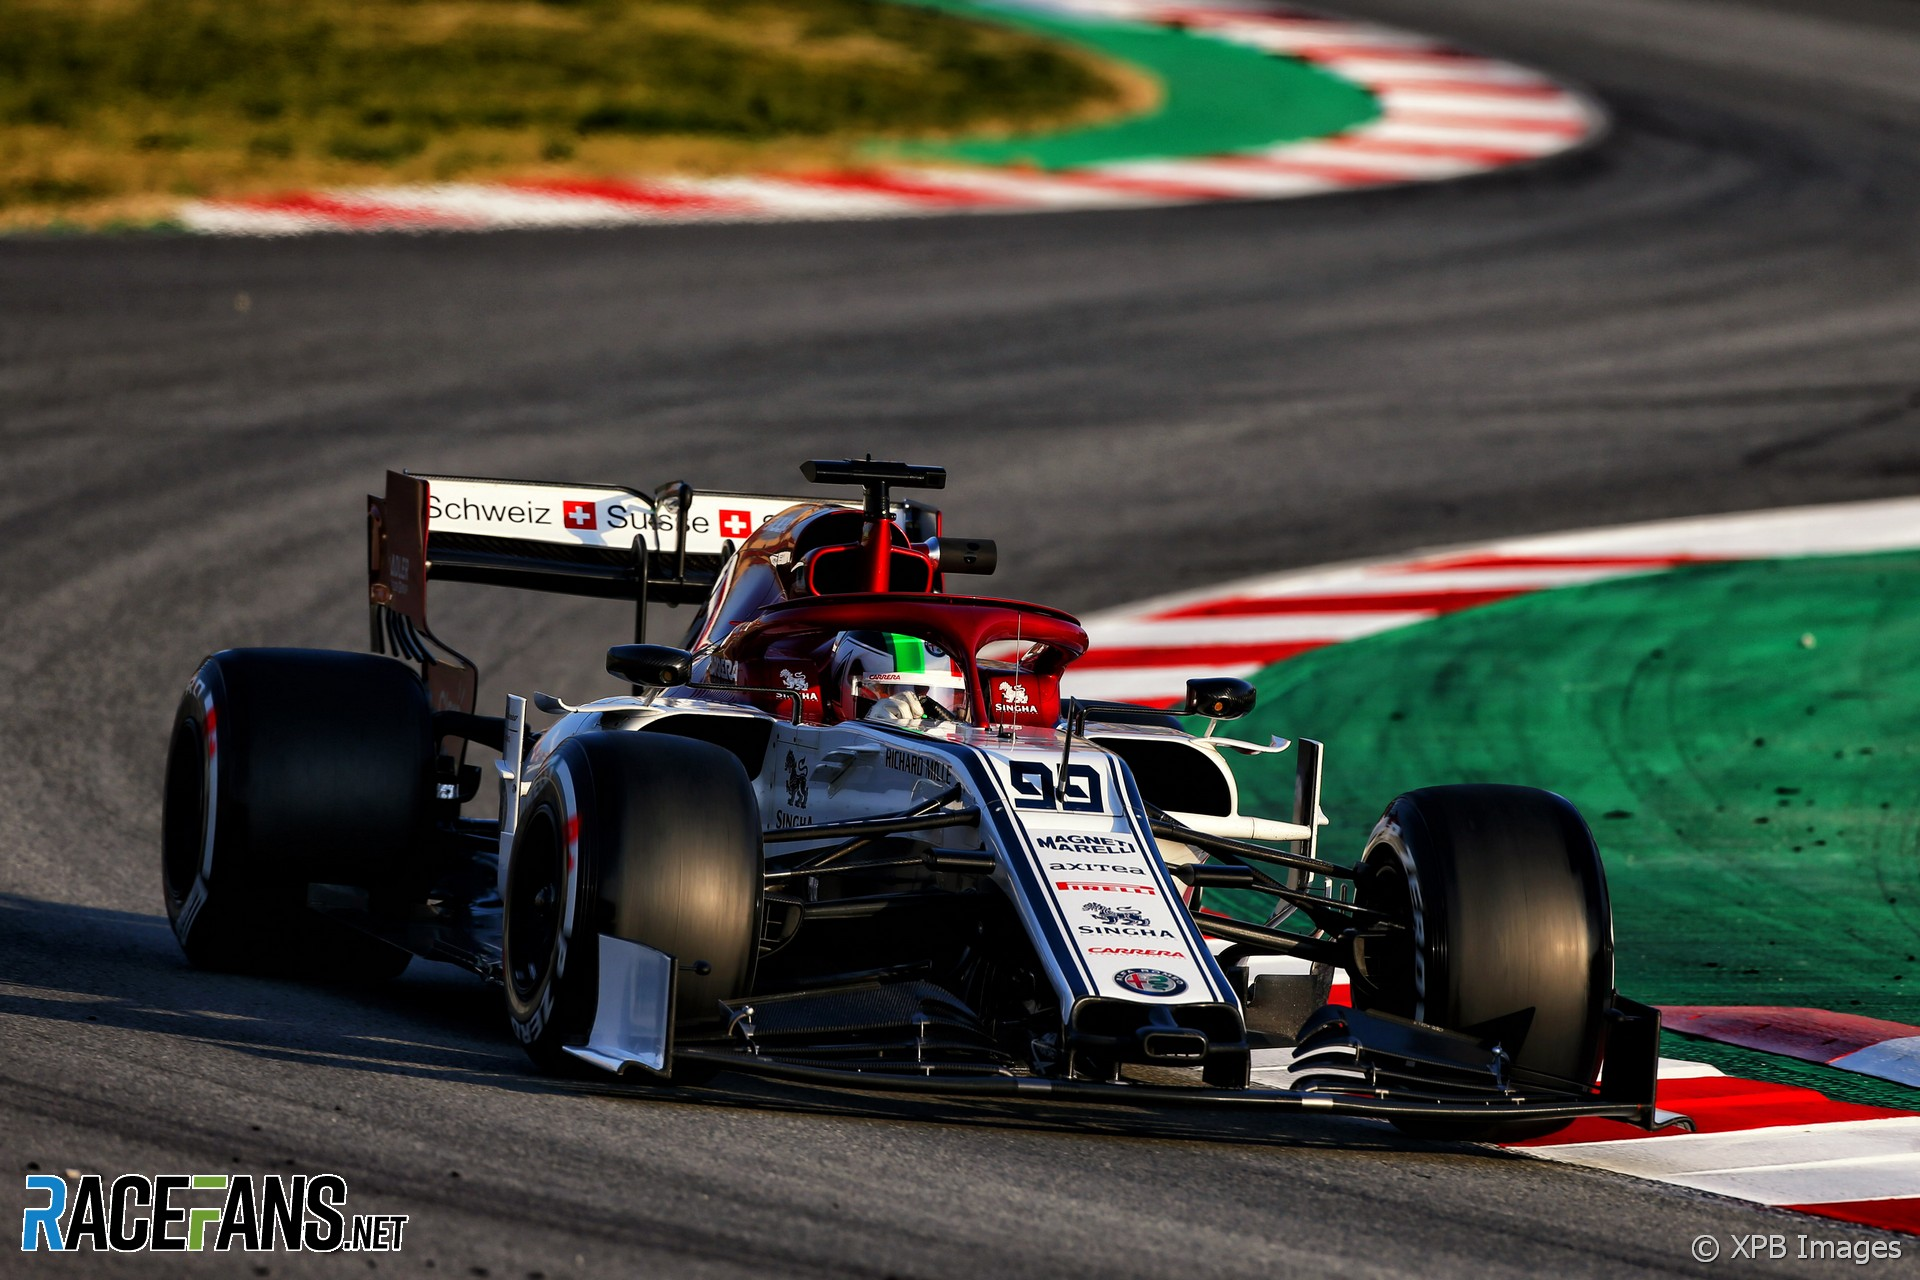 Antonio Giovinazzi, Alfa Romeo, Circuit de Catalunya, 2019